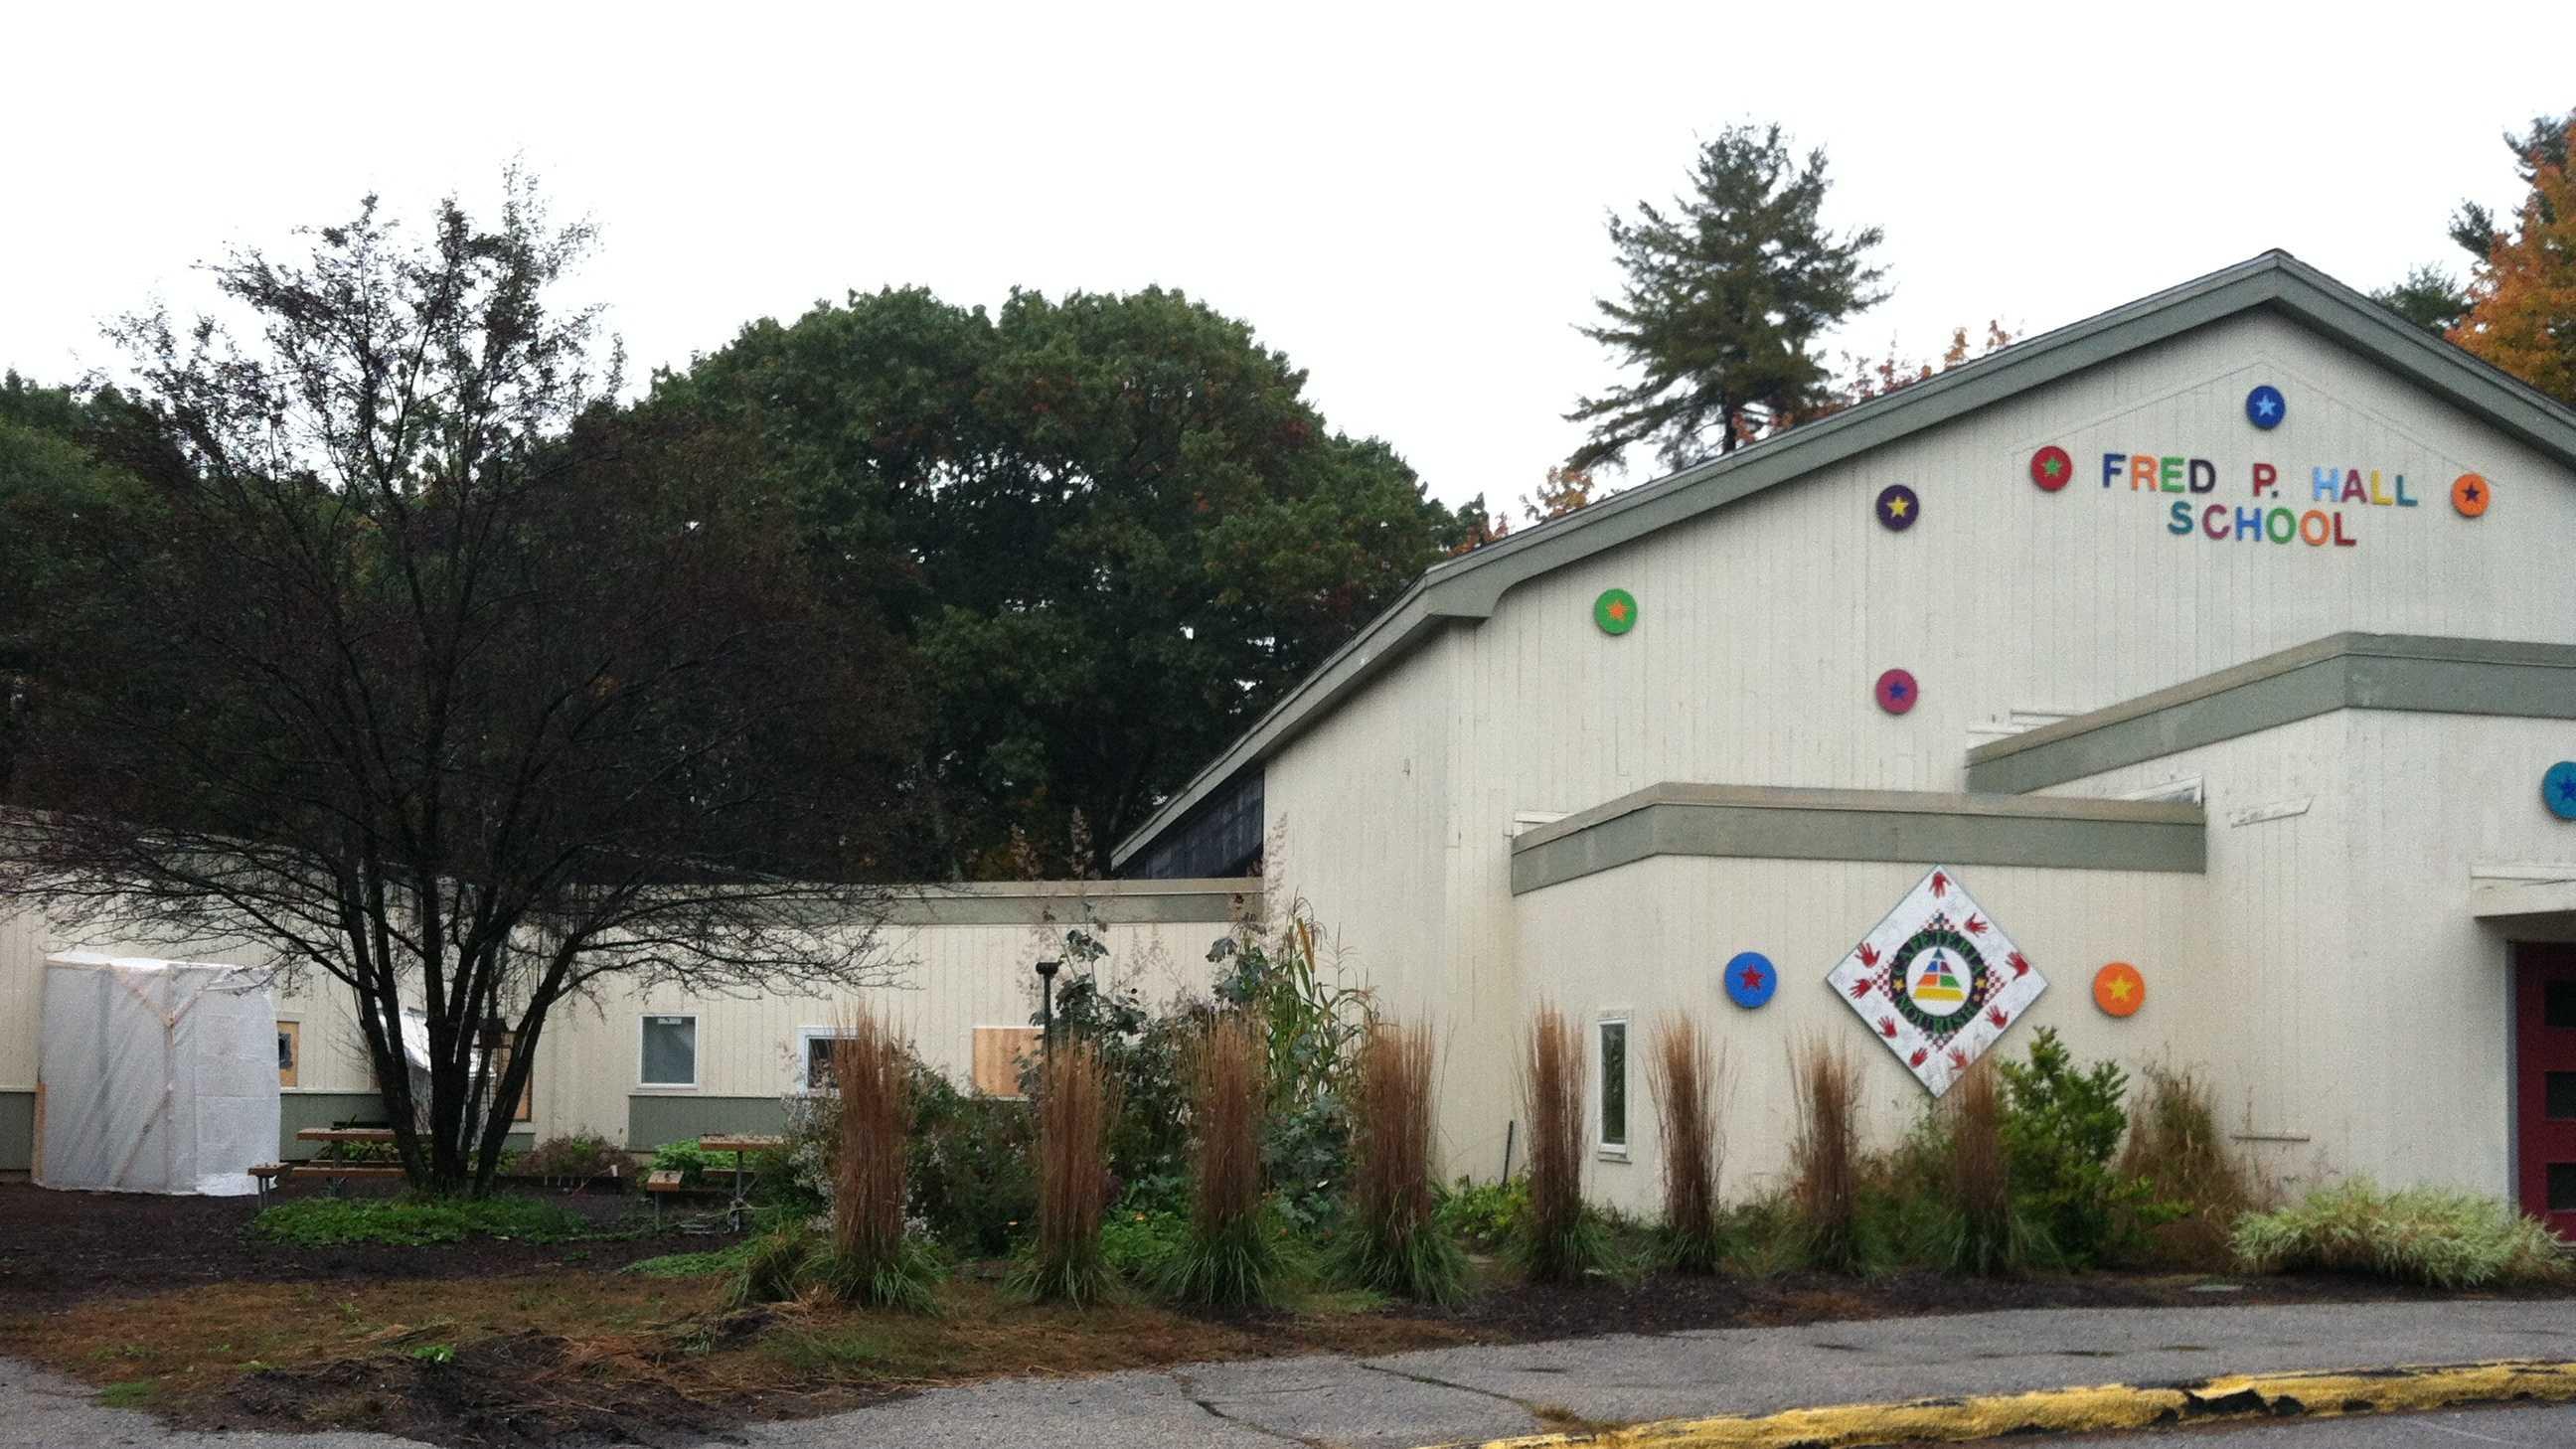 Hall Elementary School